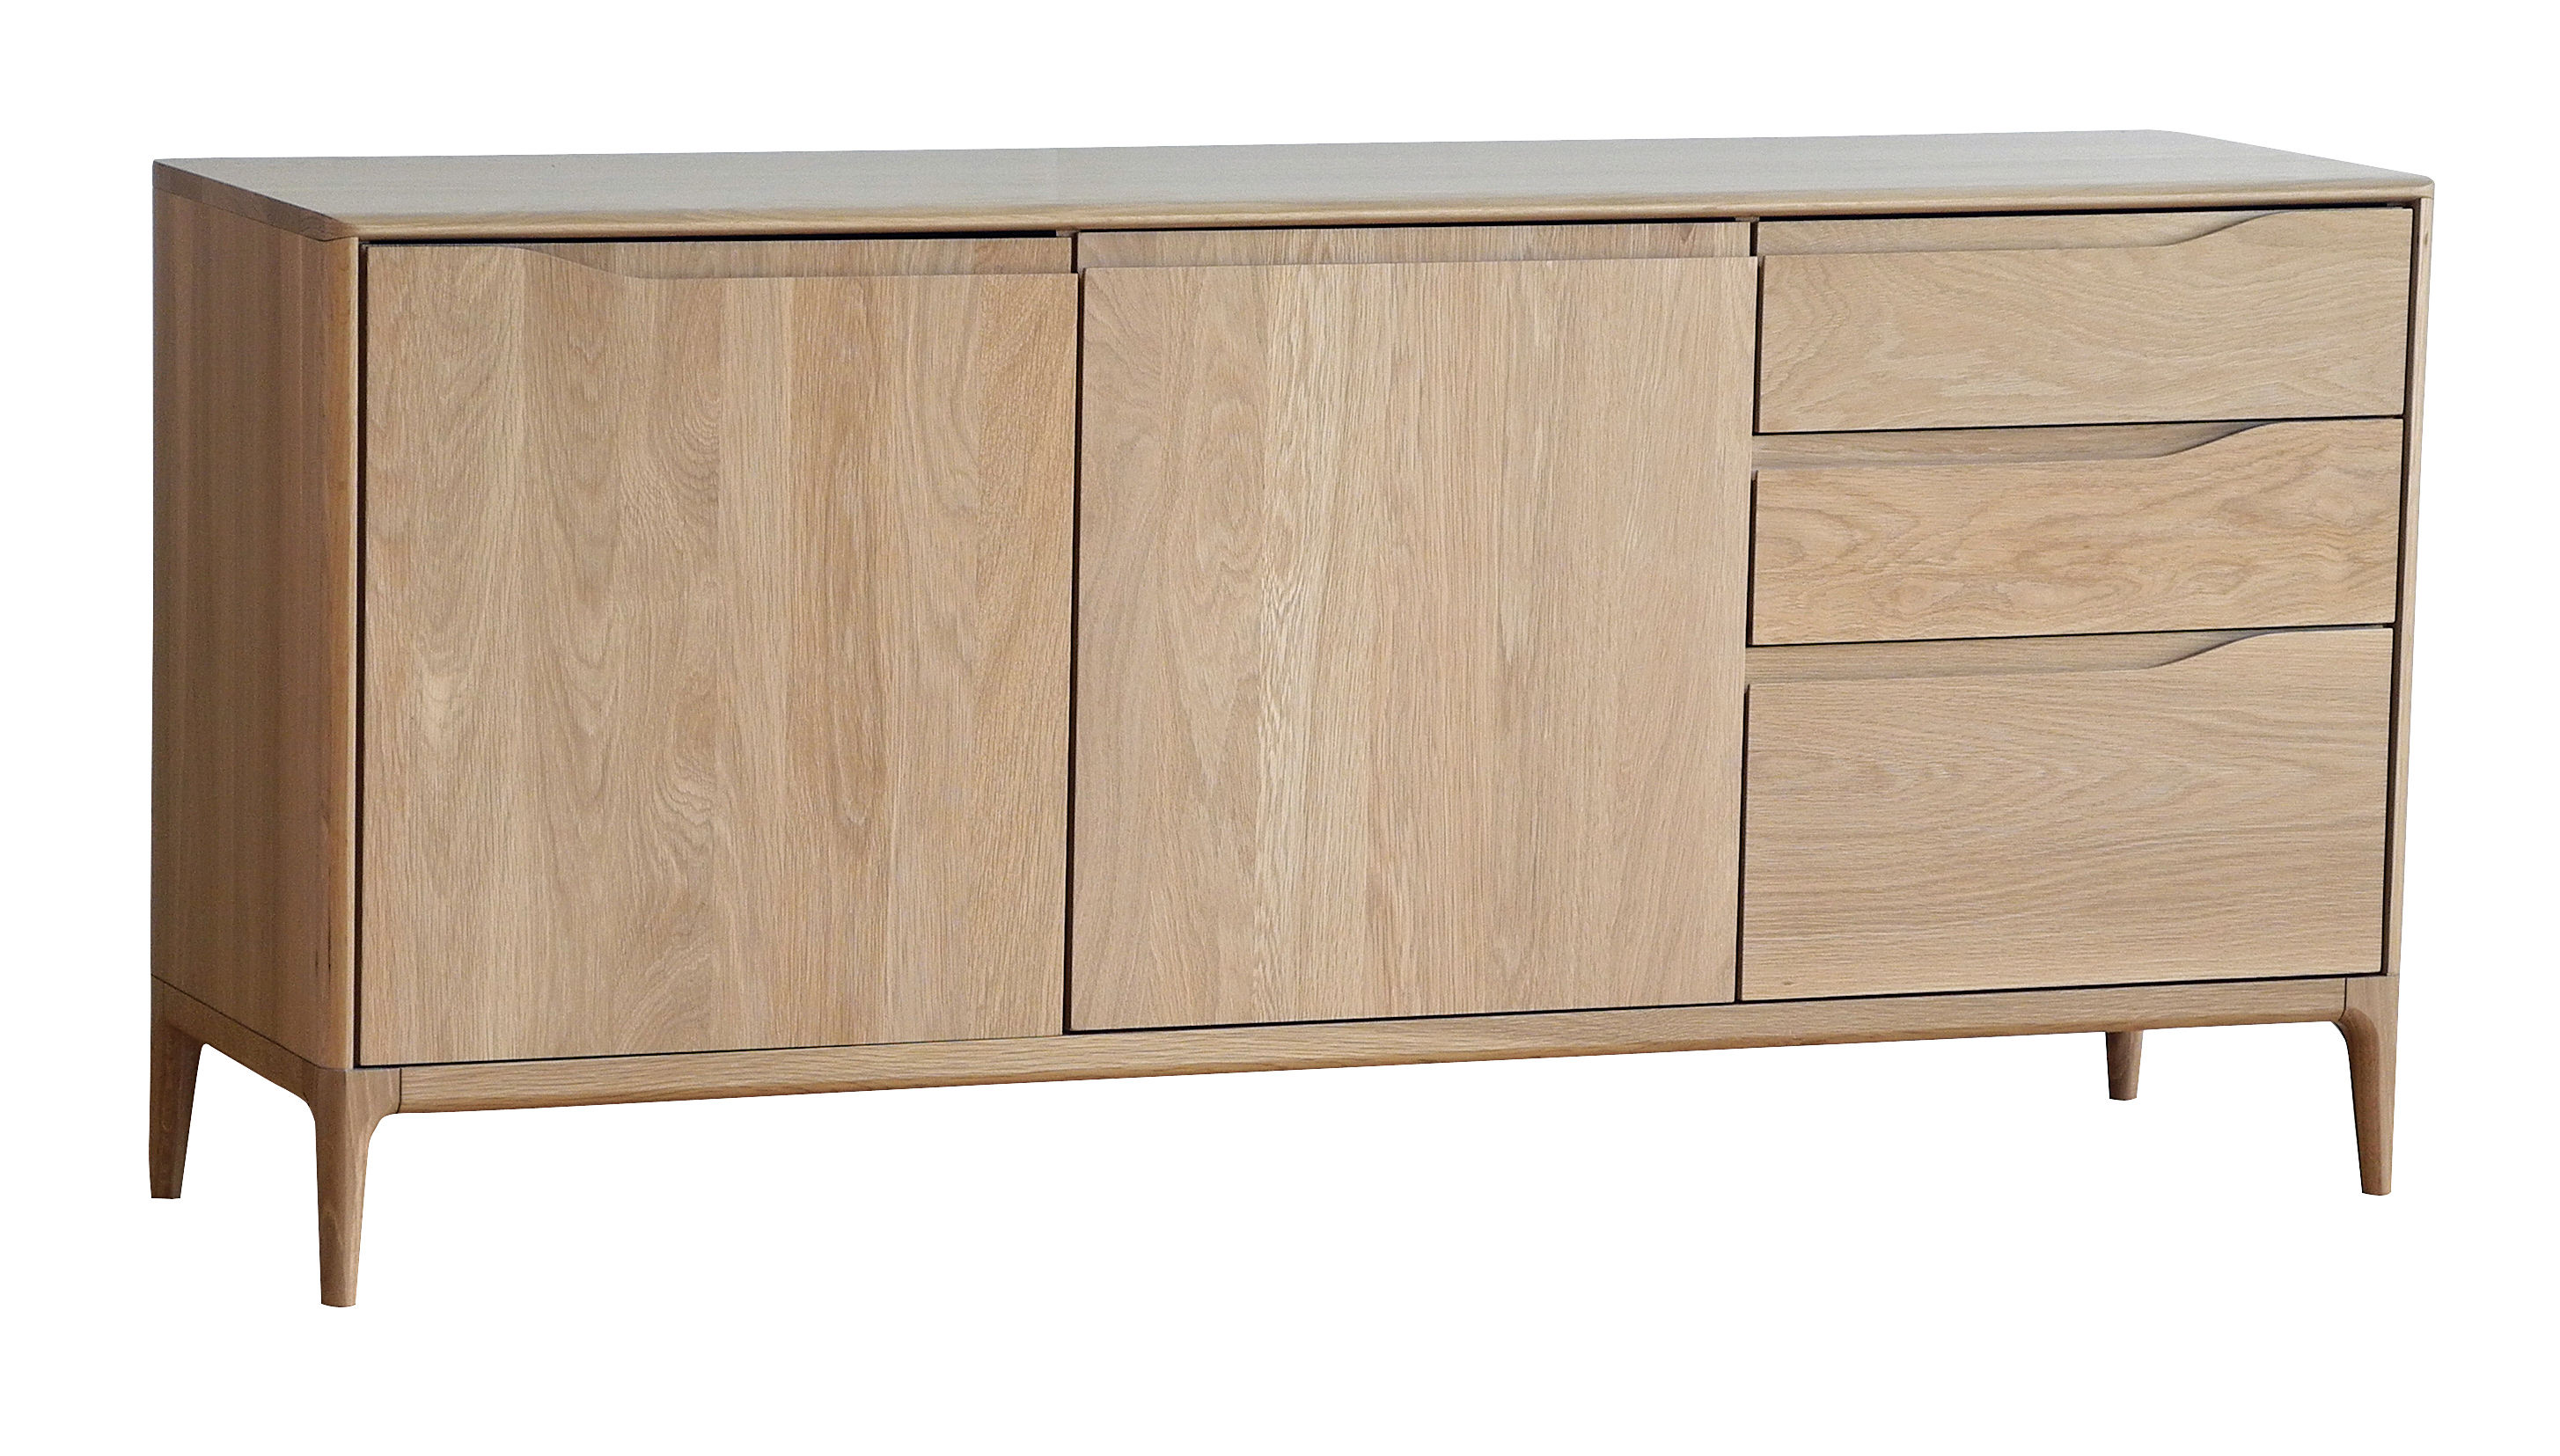 buffet romana ch ne l 160 cm ch ne naturel ercol. Black Bedroom Furniture Sets. Home Design Ideas